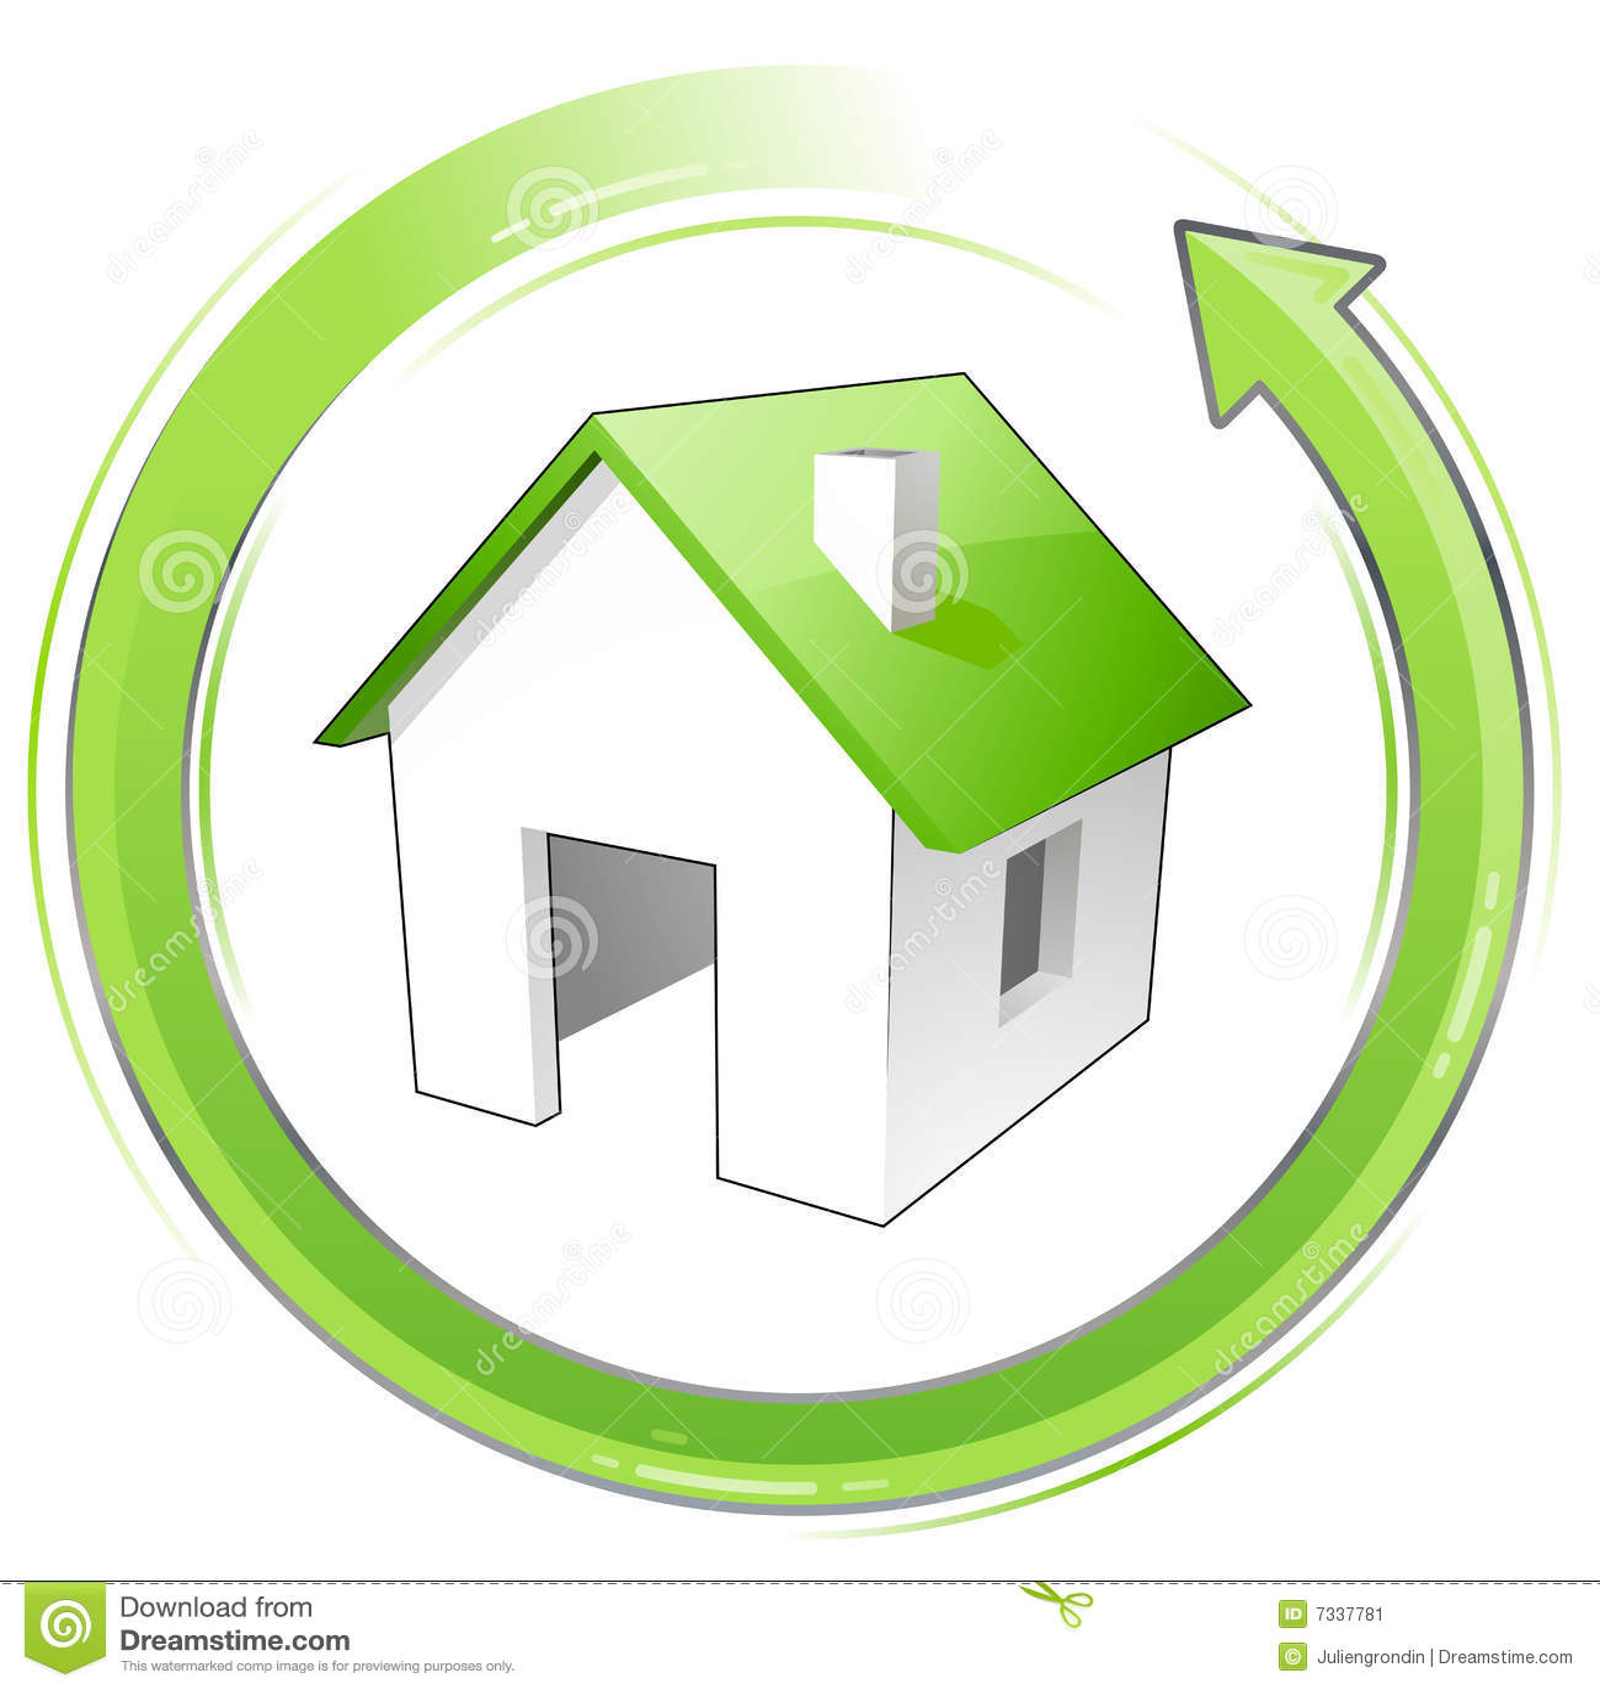 little green house stock vector illustration of arrow. Black Bedroom Furniture Sets. Home Design Ideas